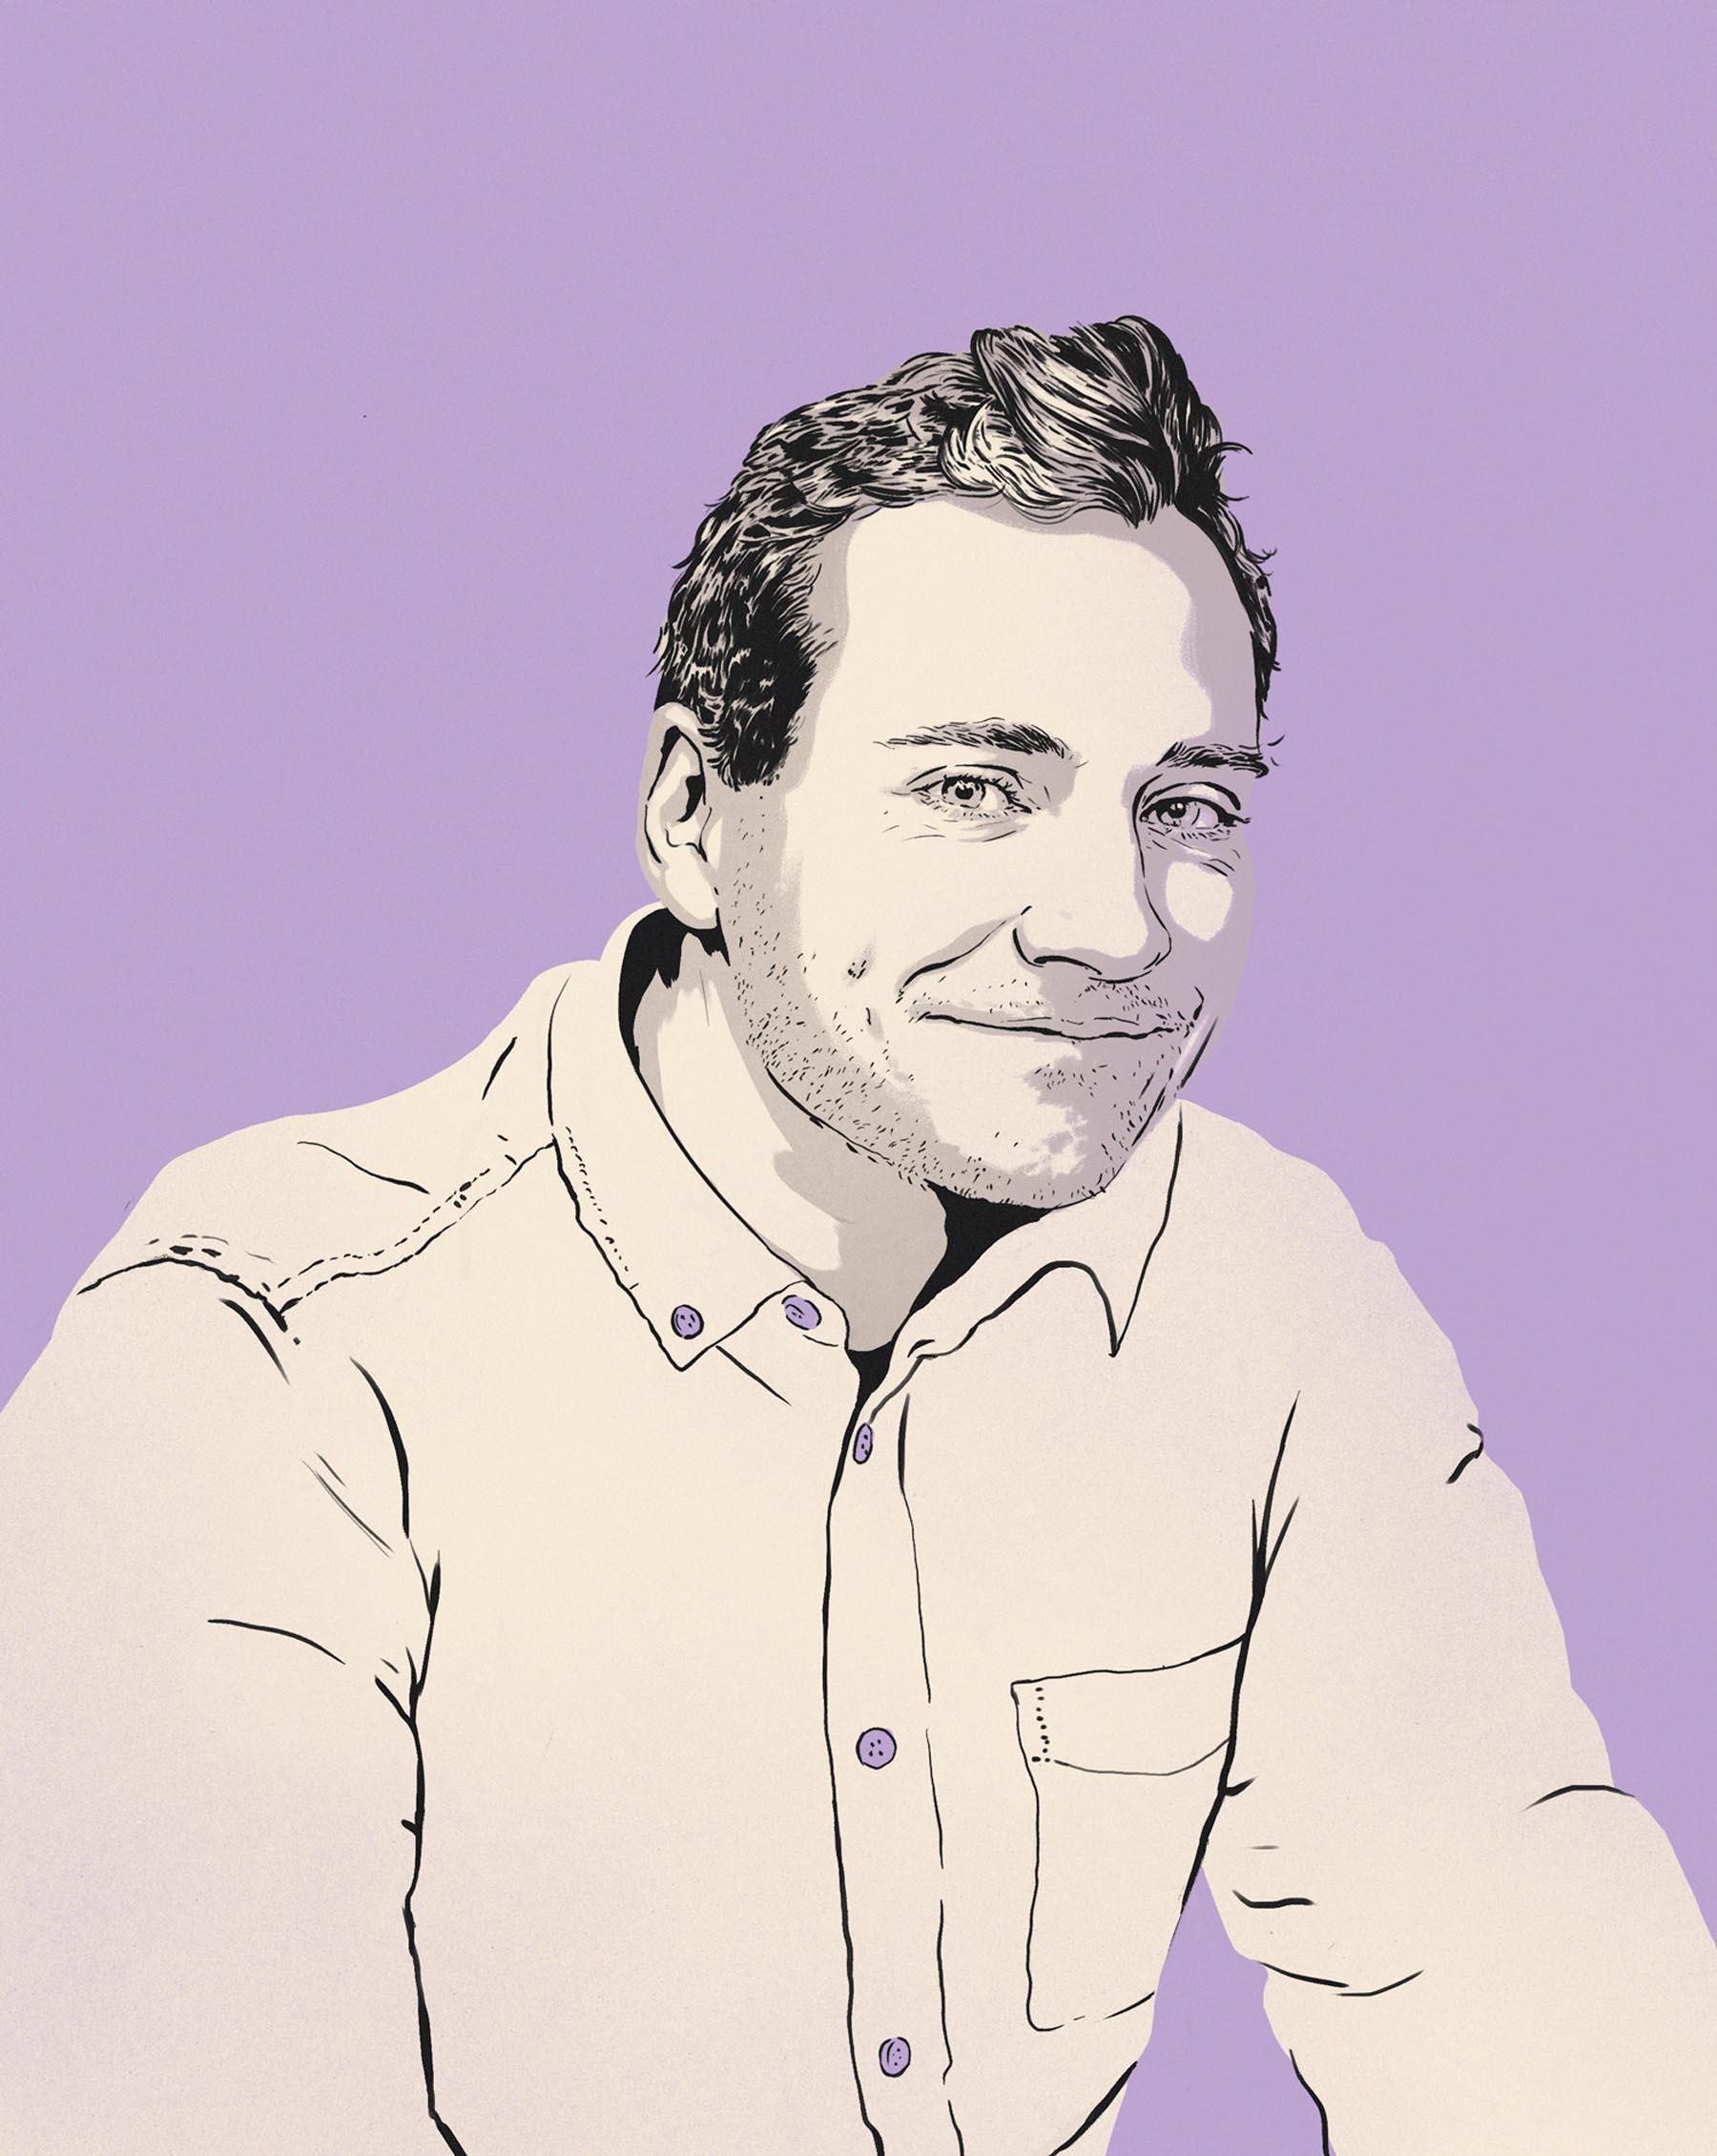 An illustrated portrait if Cameron Stark.